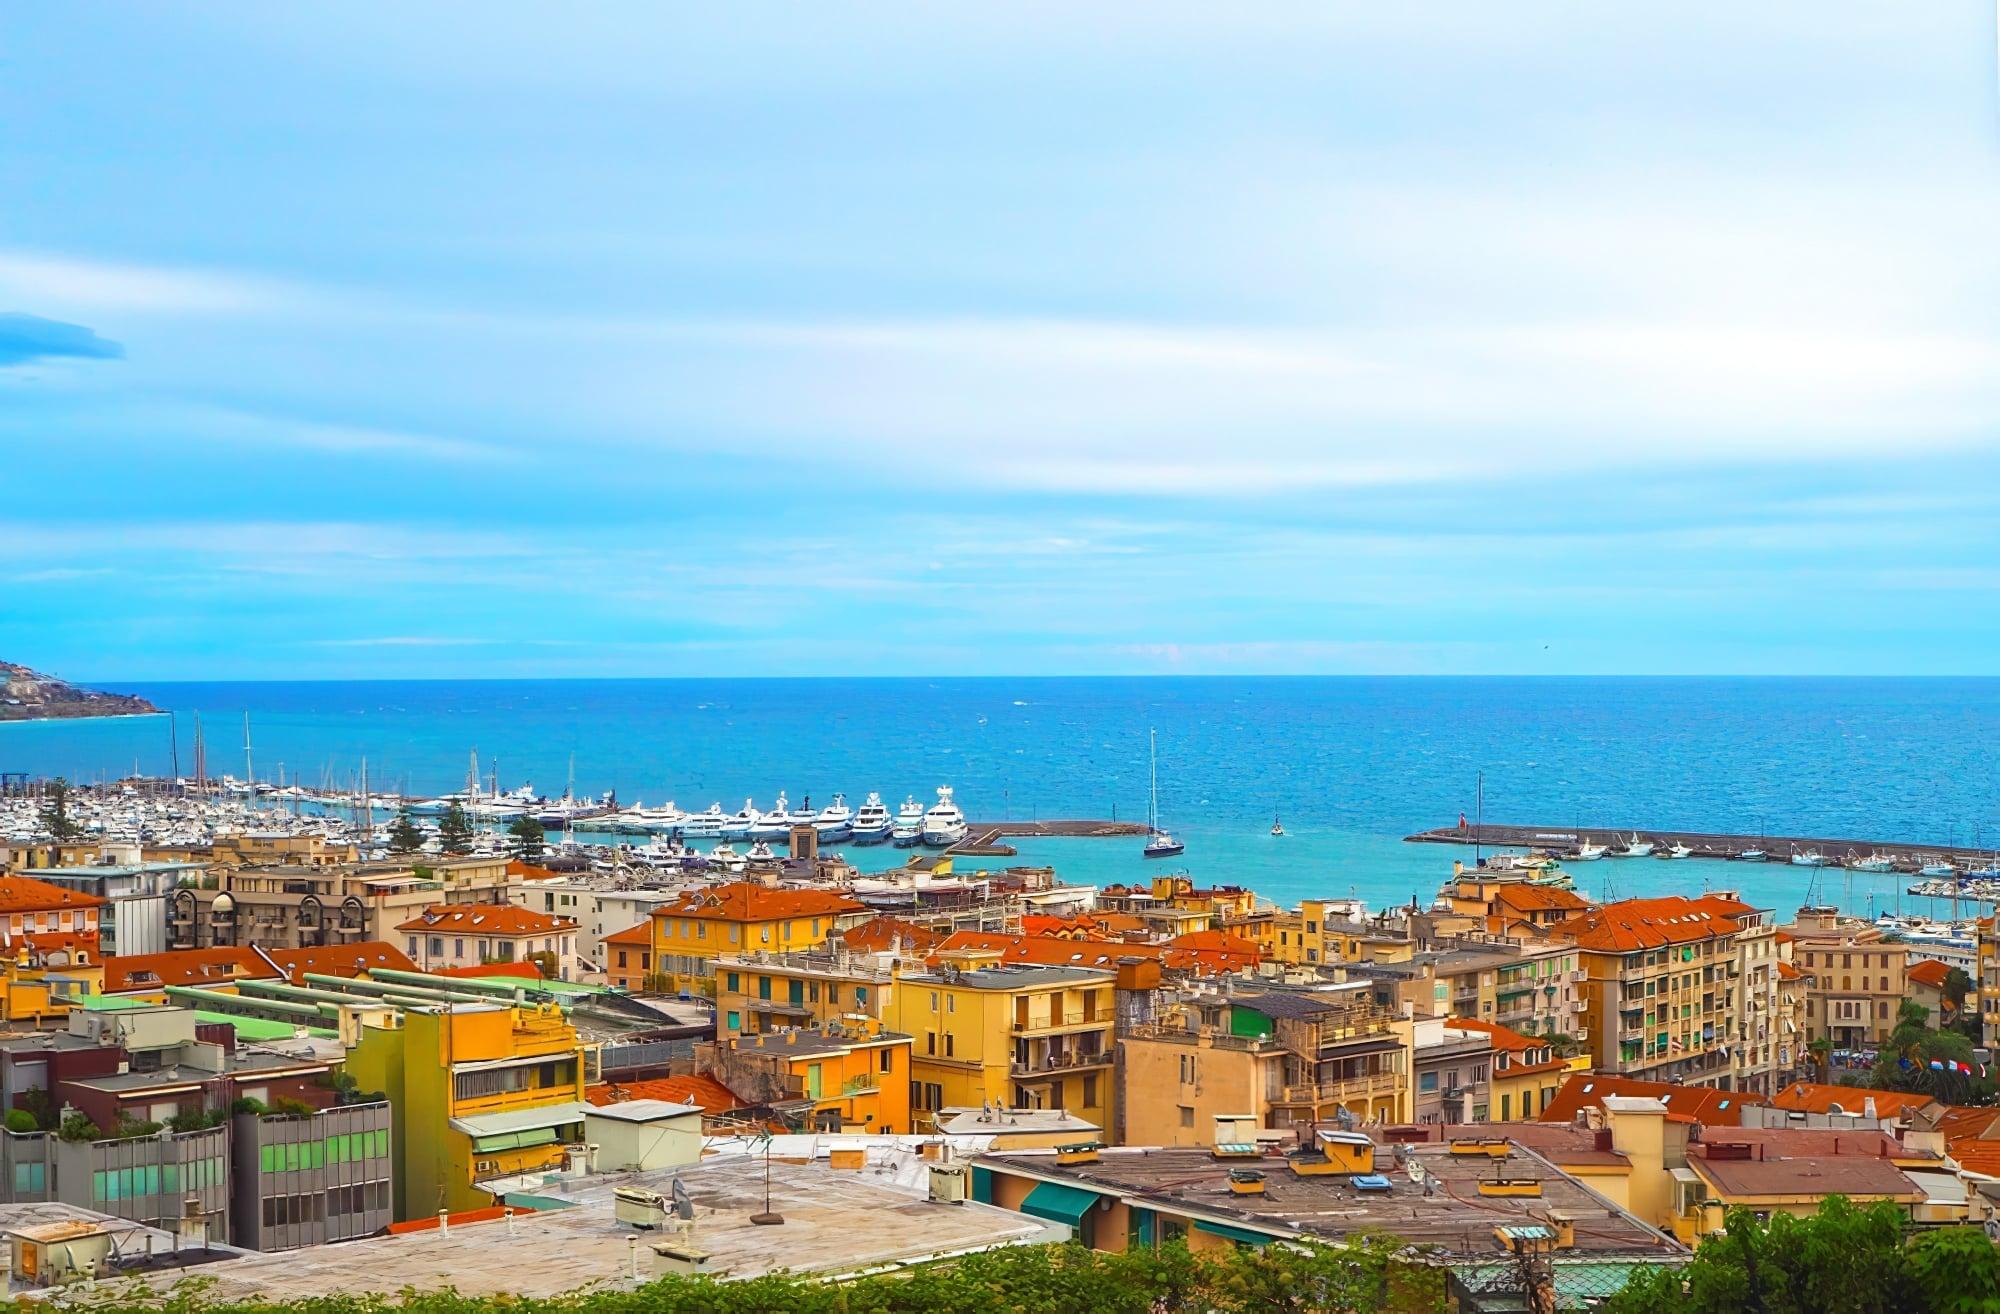 Vue sur le port de Sanremo